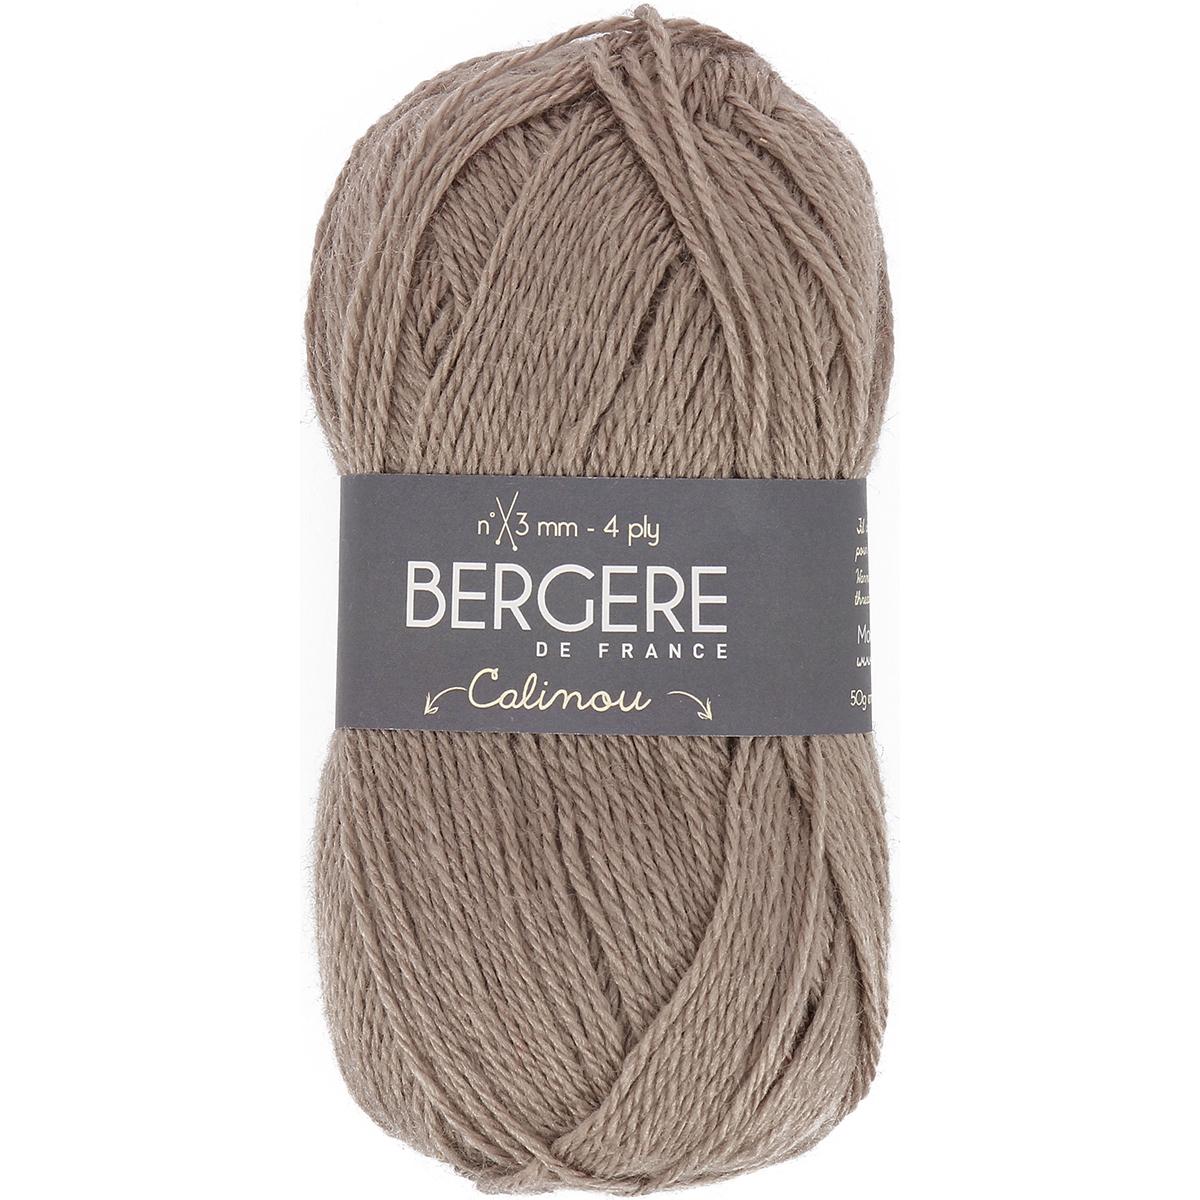 Bergere De France Calinou Yarn-Ourson - image 1 of 1